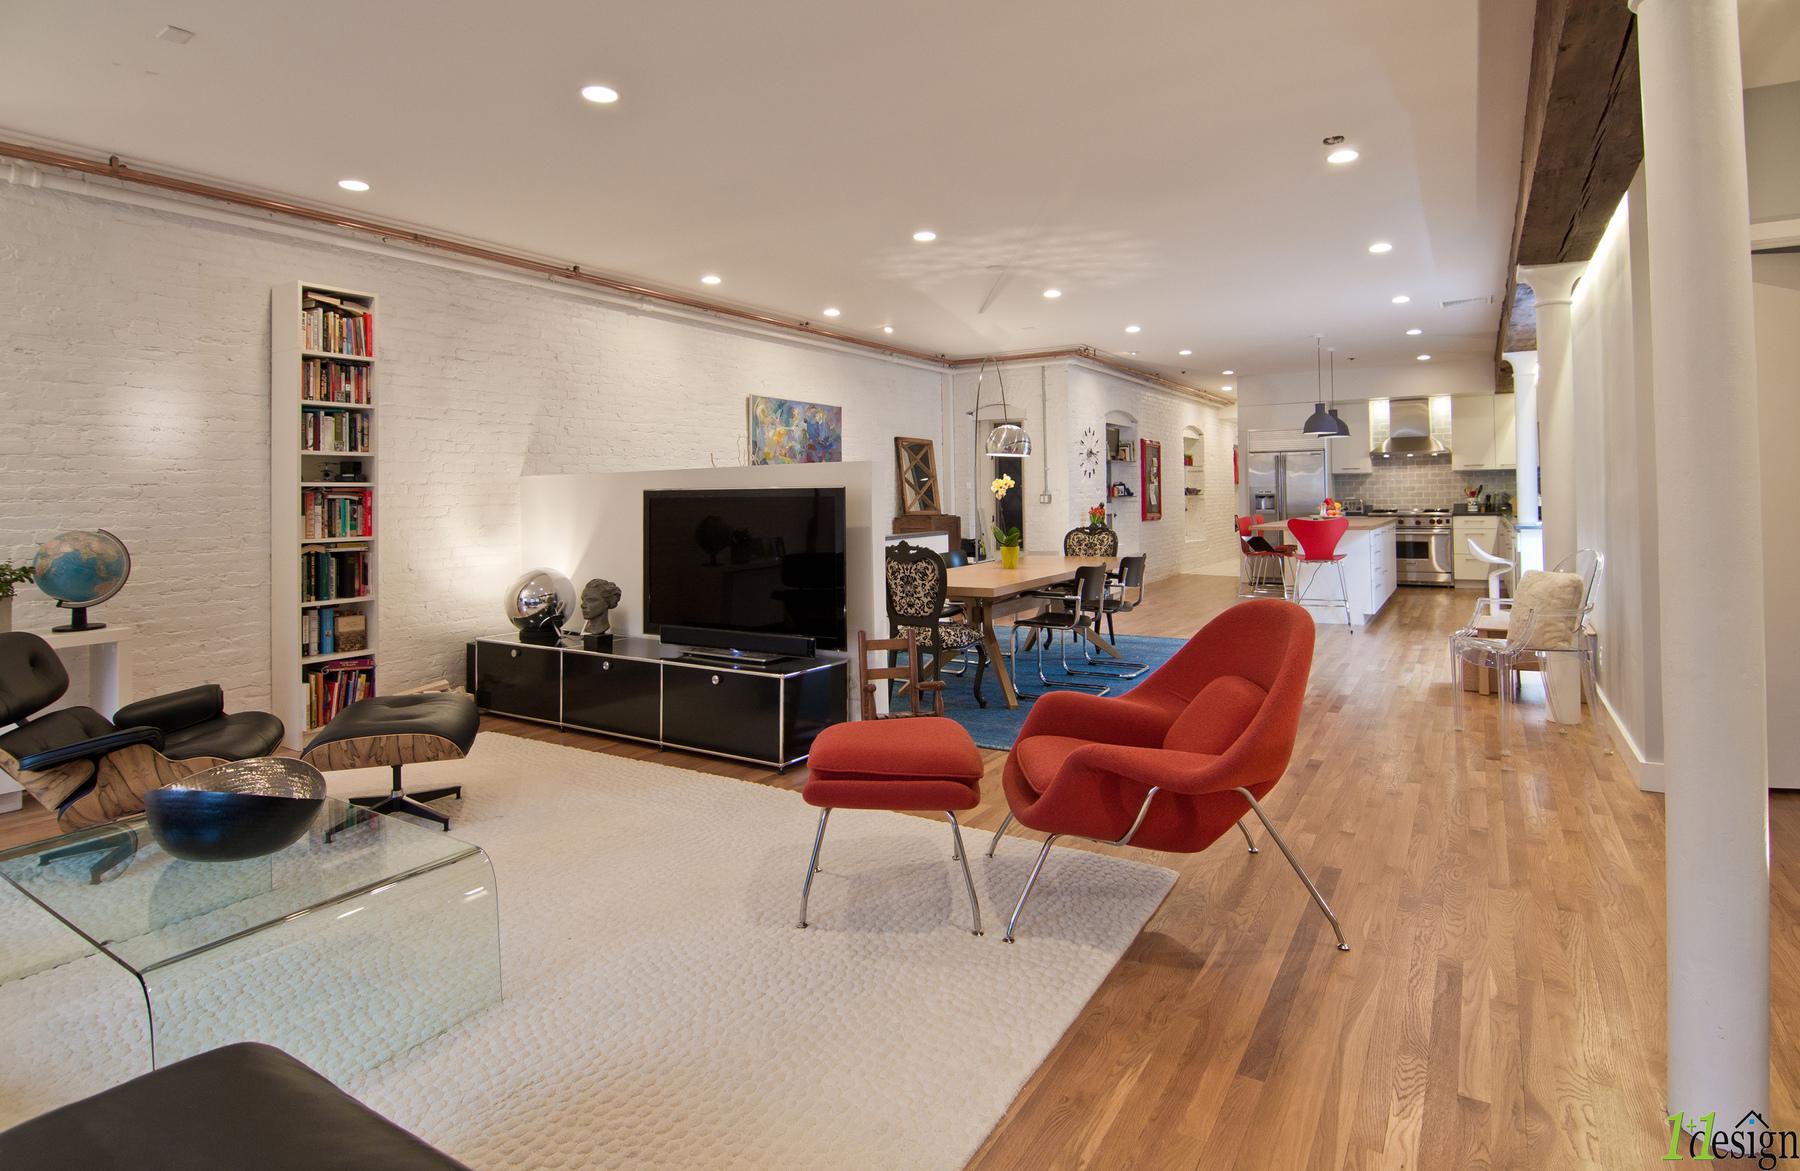 living room boston l shape sofa set designs for small loft a hingham based residential commercial 1 plus design architectural family massachusetts new england eames recliner interior designer kitchen roo